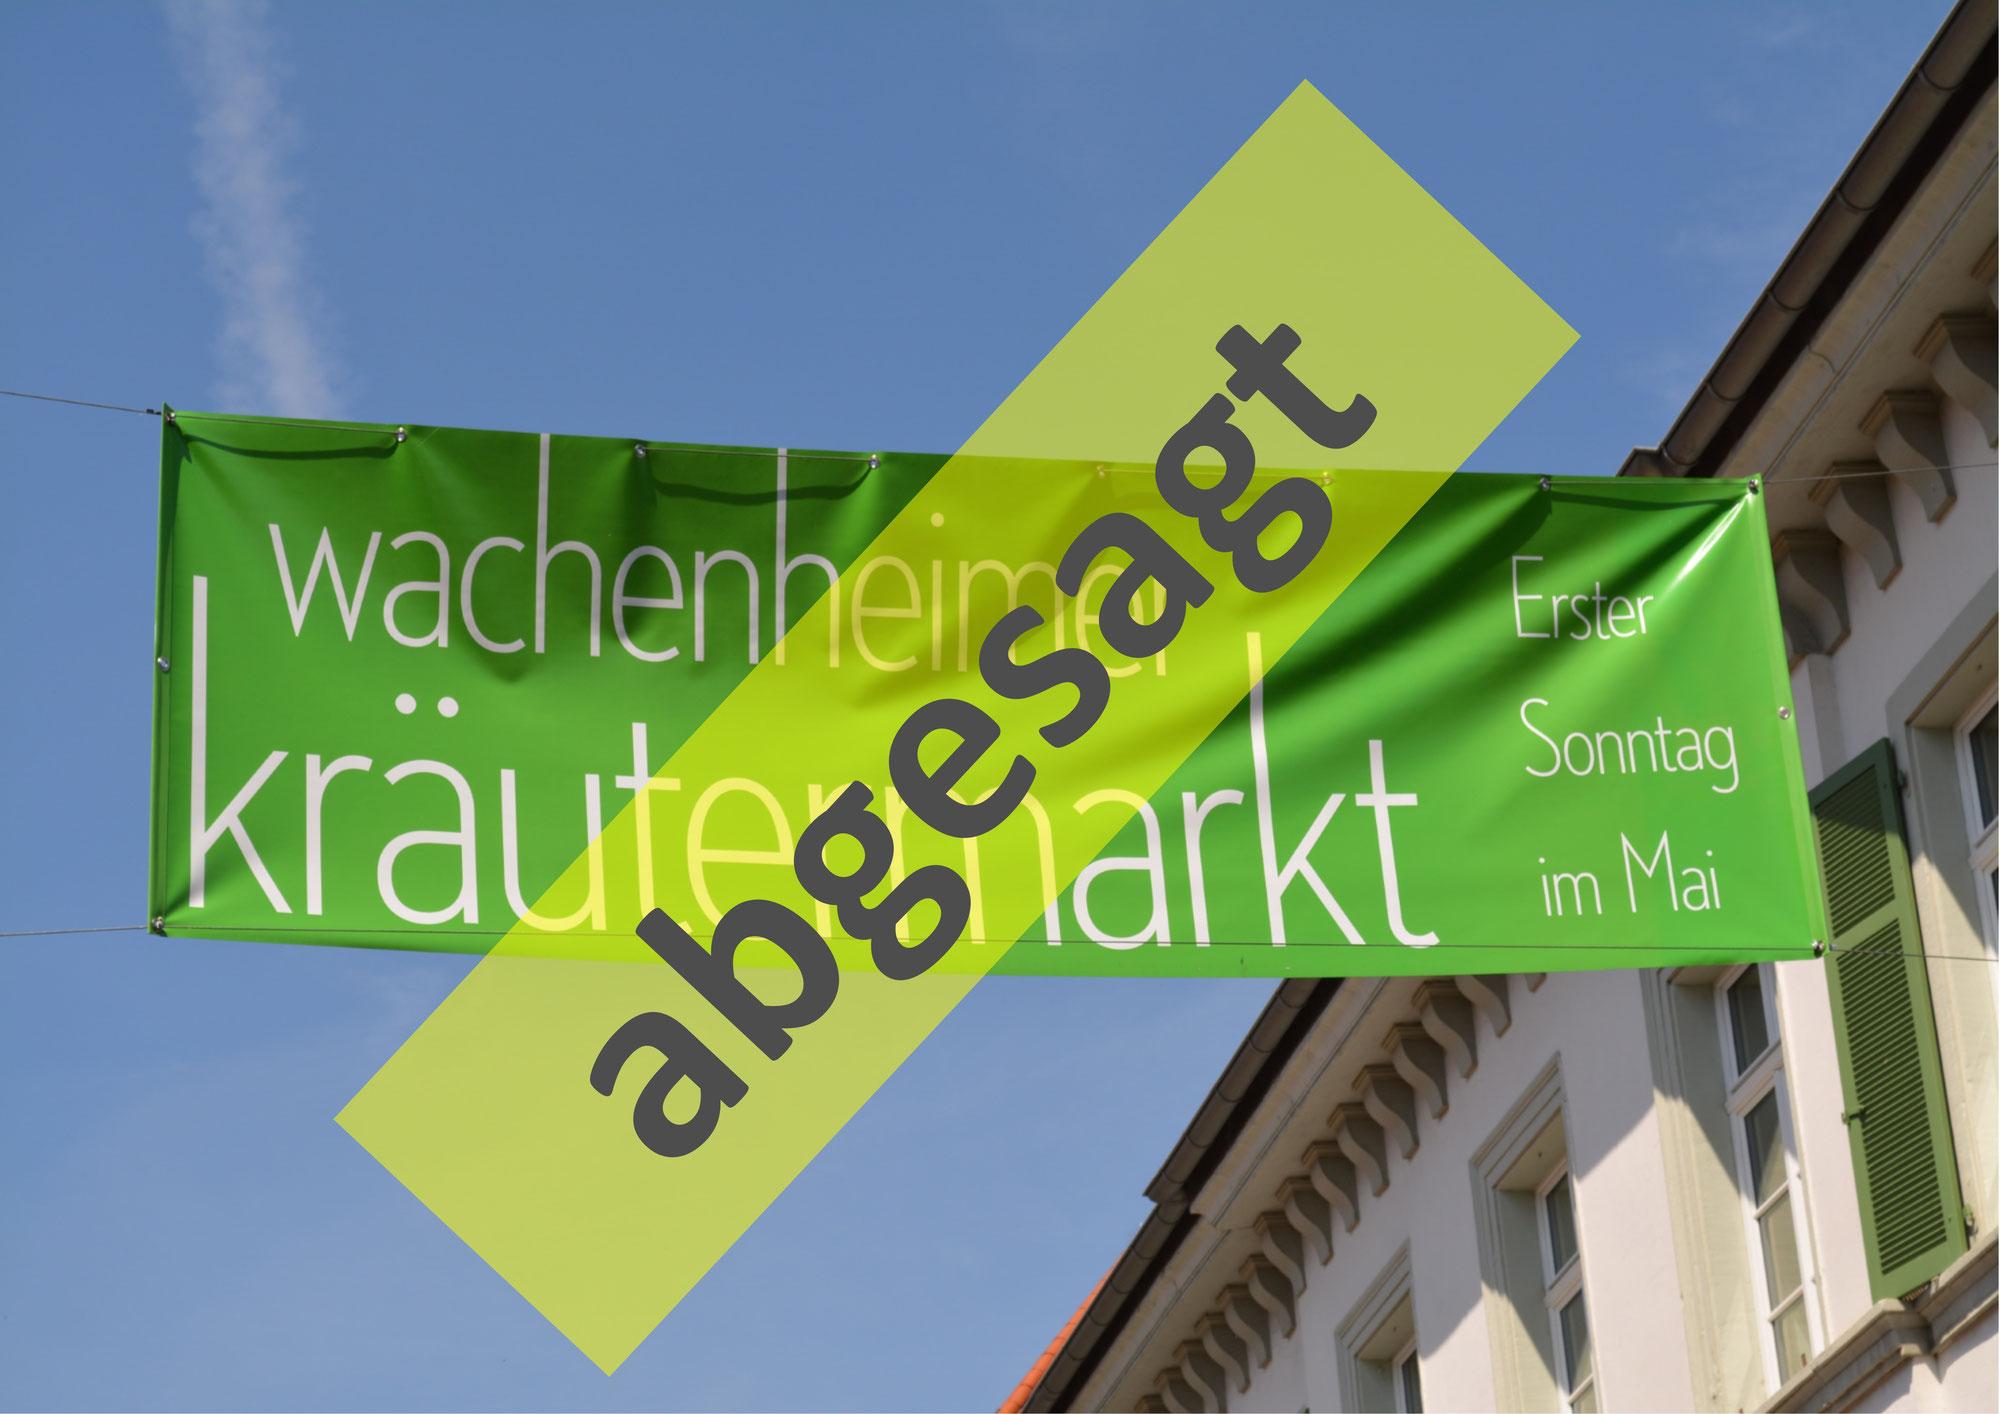 Wachenheimer Kräutermarkt am 9. Mai 2021 ist abgesagt.